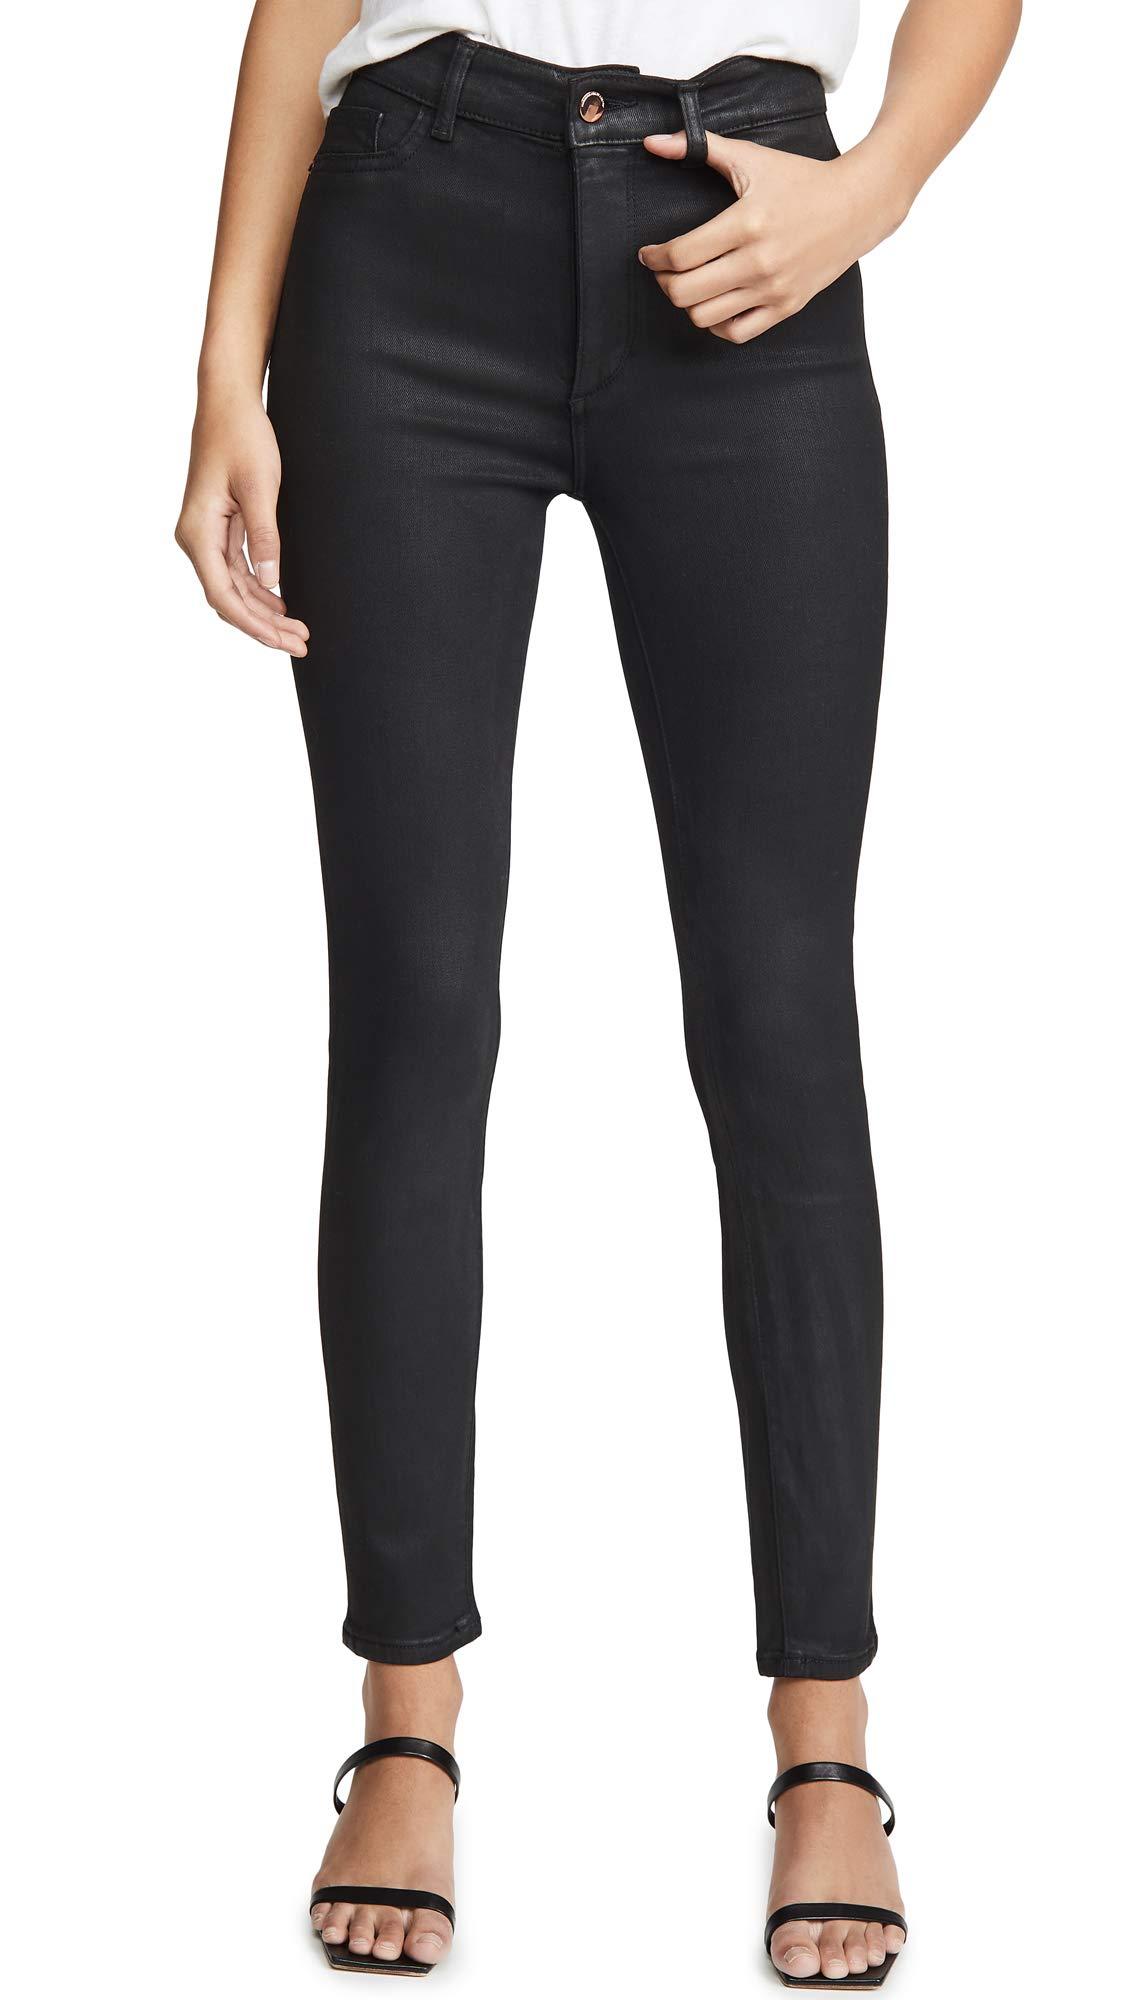 DL1961 Women's x Marianna Hewitt Farrow Ankle High Rise Skinny Jeans